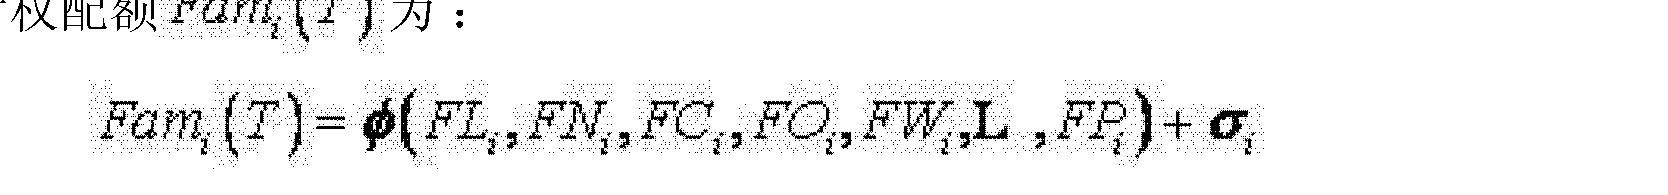 Figure CN102842097AD00193